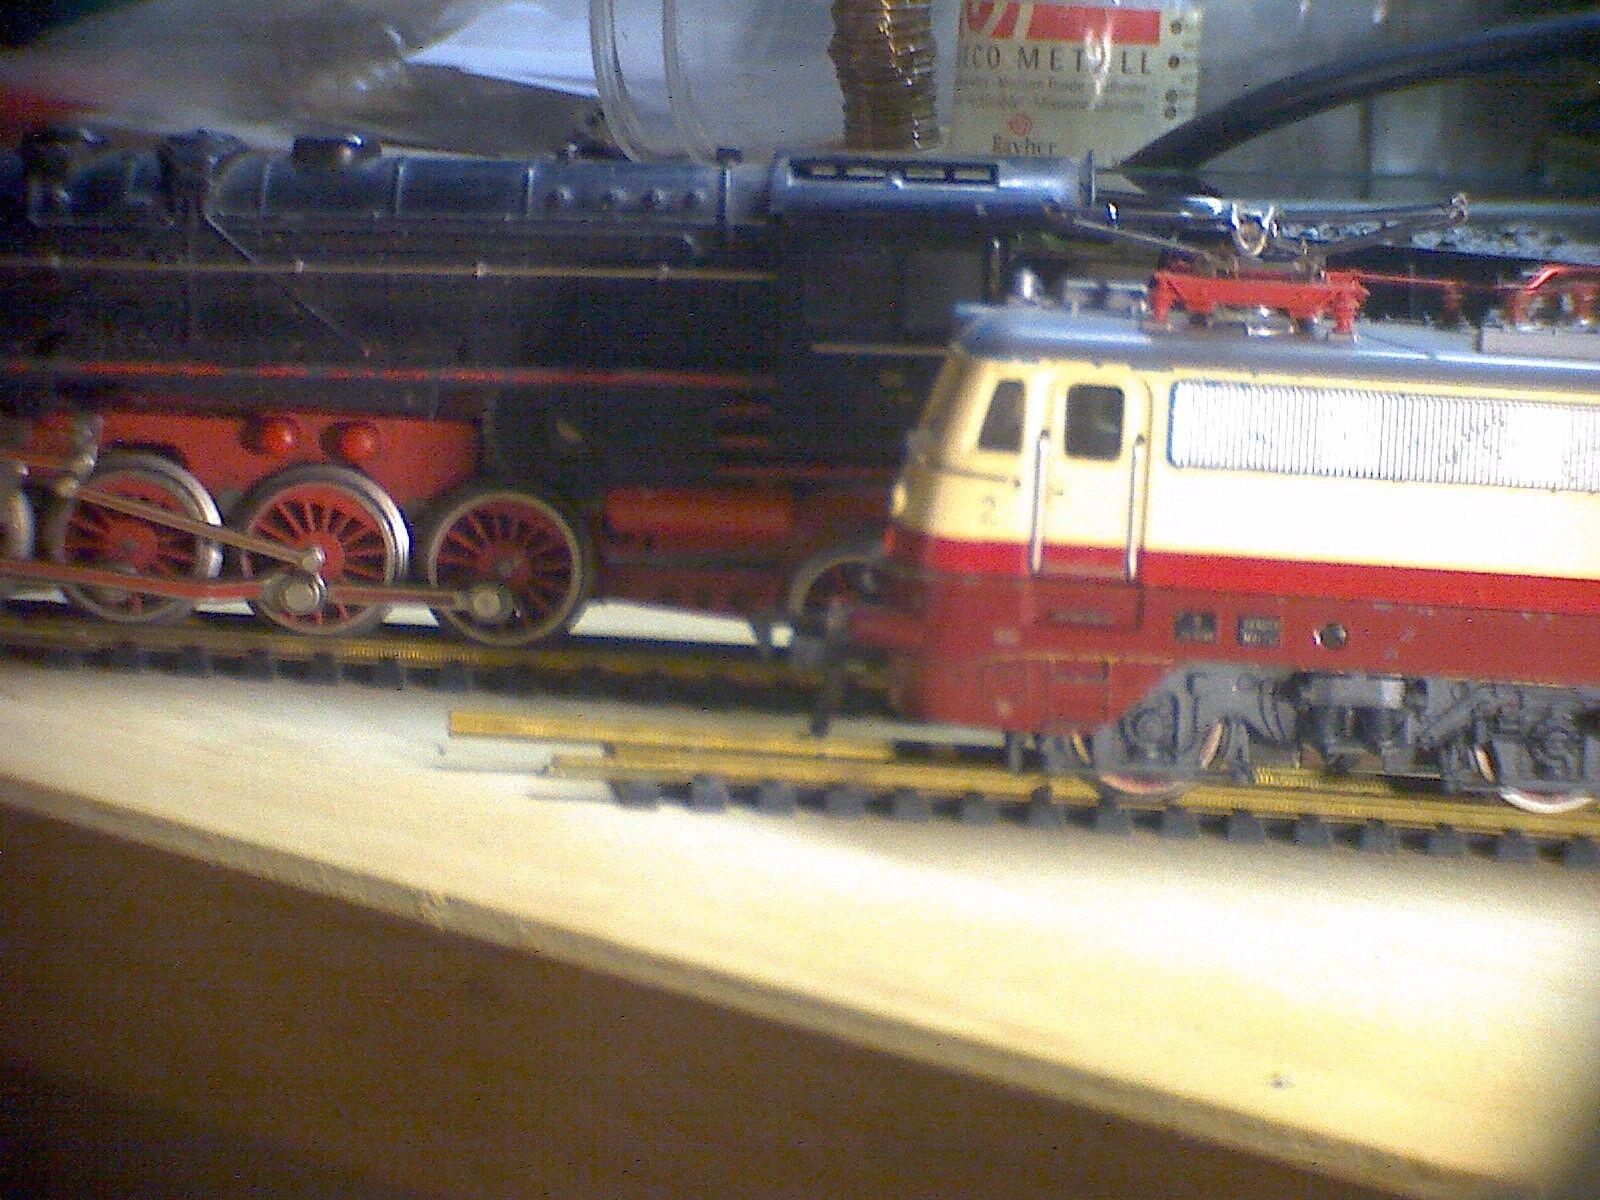 Fleischmann h0. DB máquina de vapor 41-1364 e-Lok 11 1308, vías y wagons kellerfund